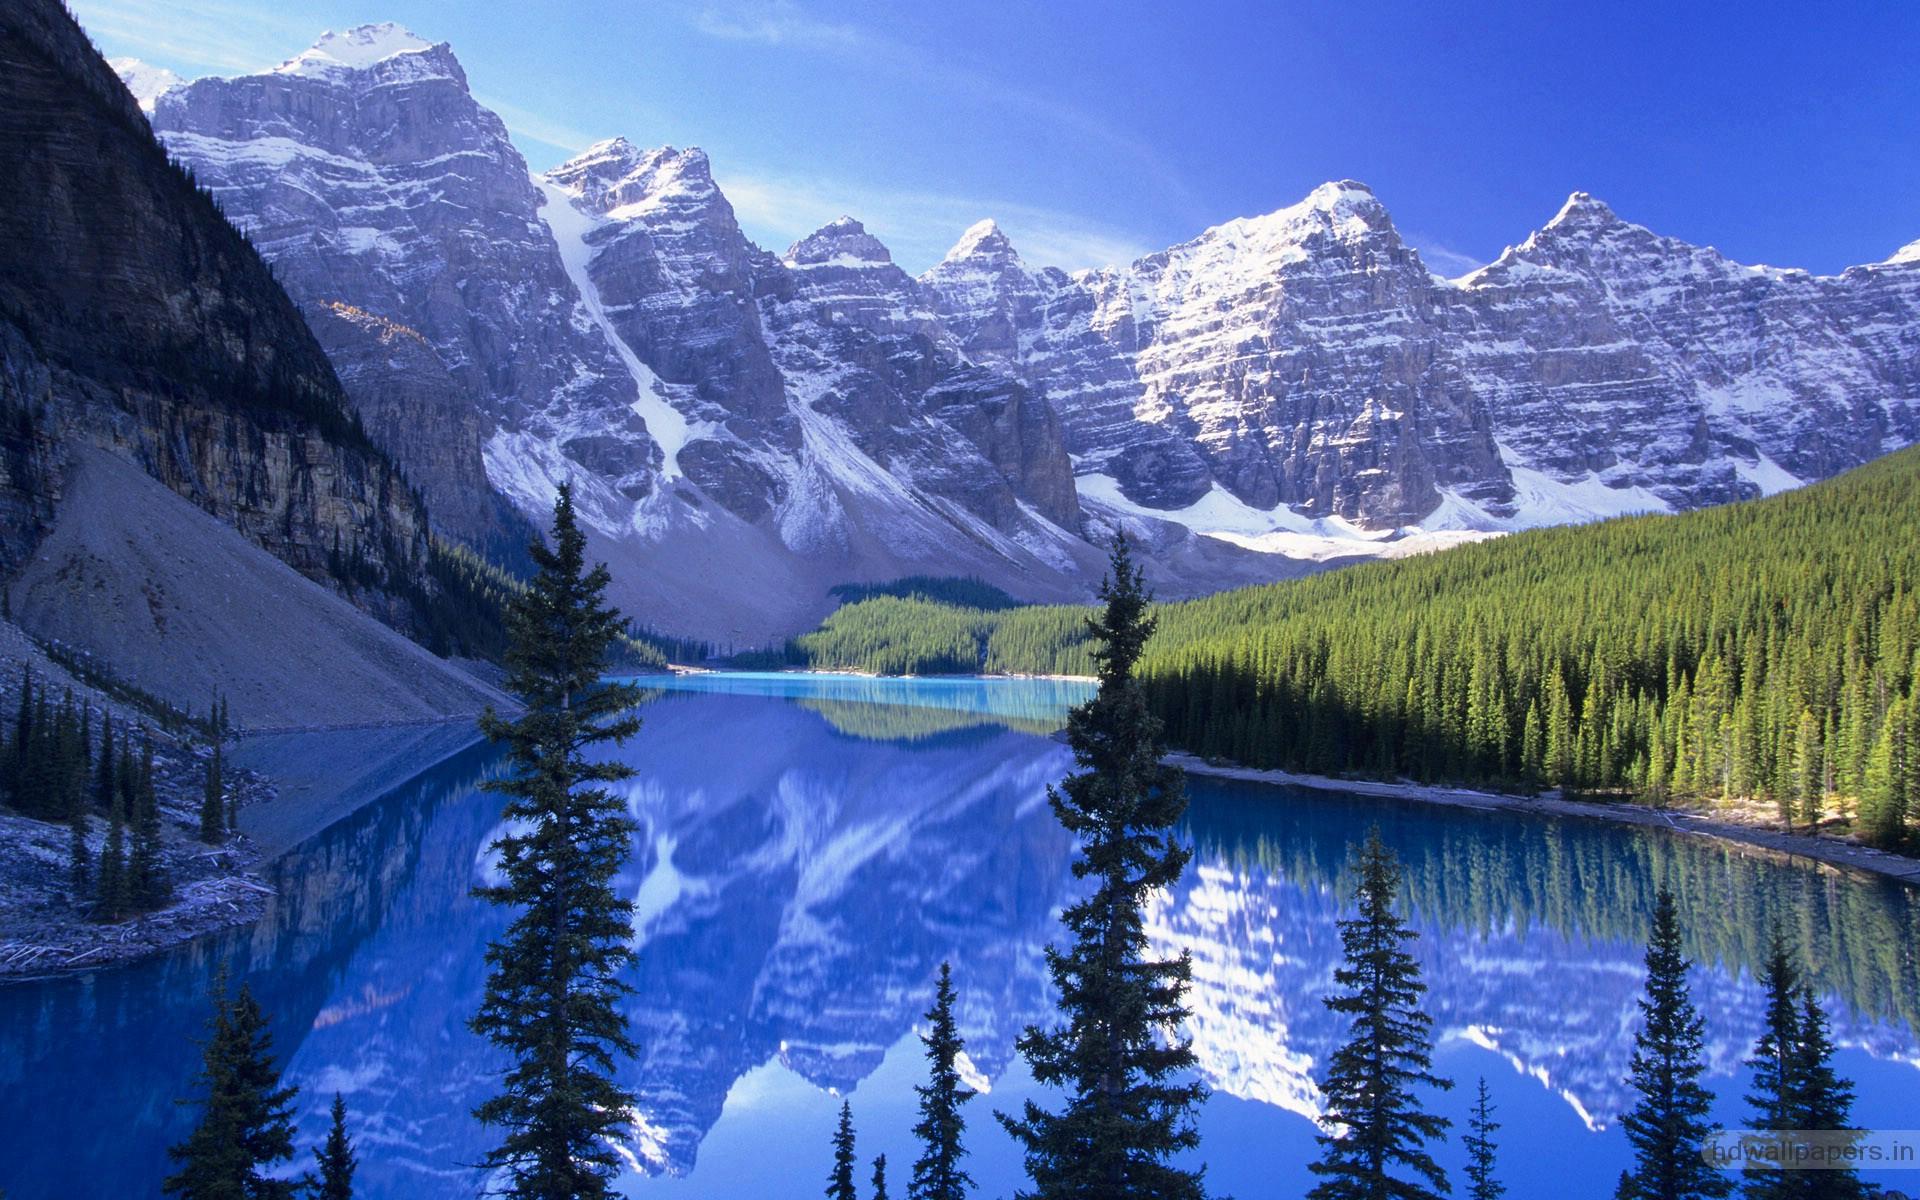 Alberta National Park Canada Wallpapers HD Wallpapers 1920x1200